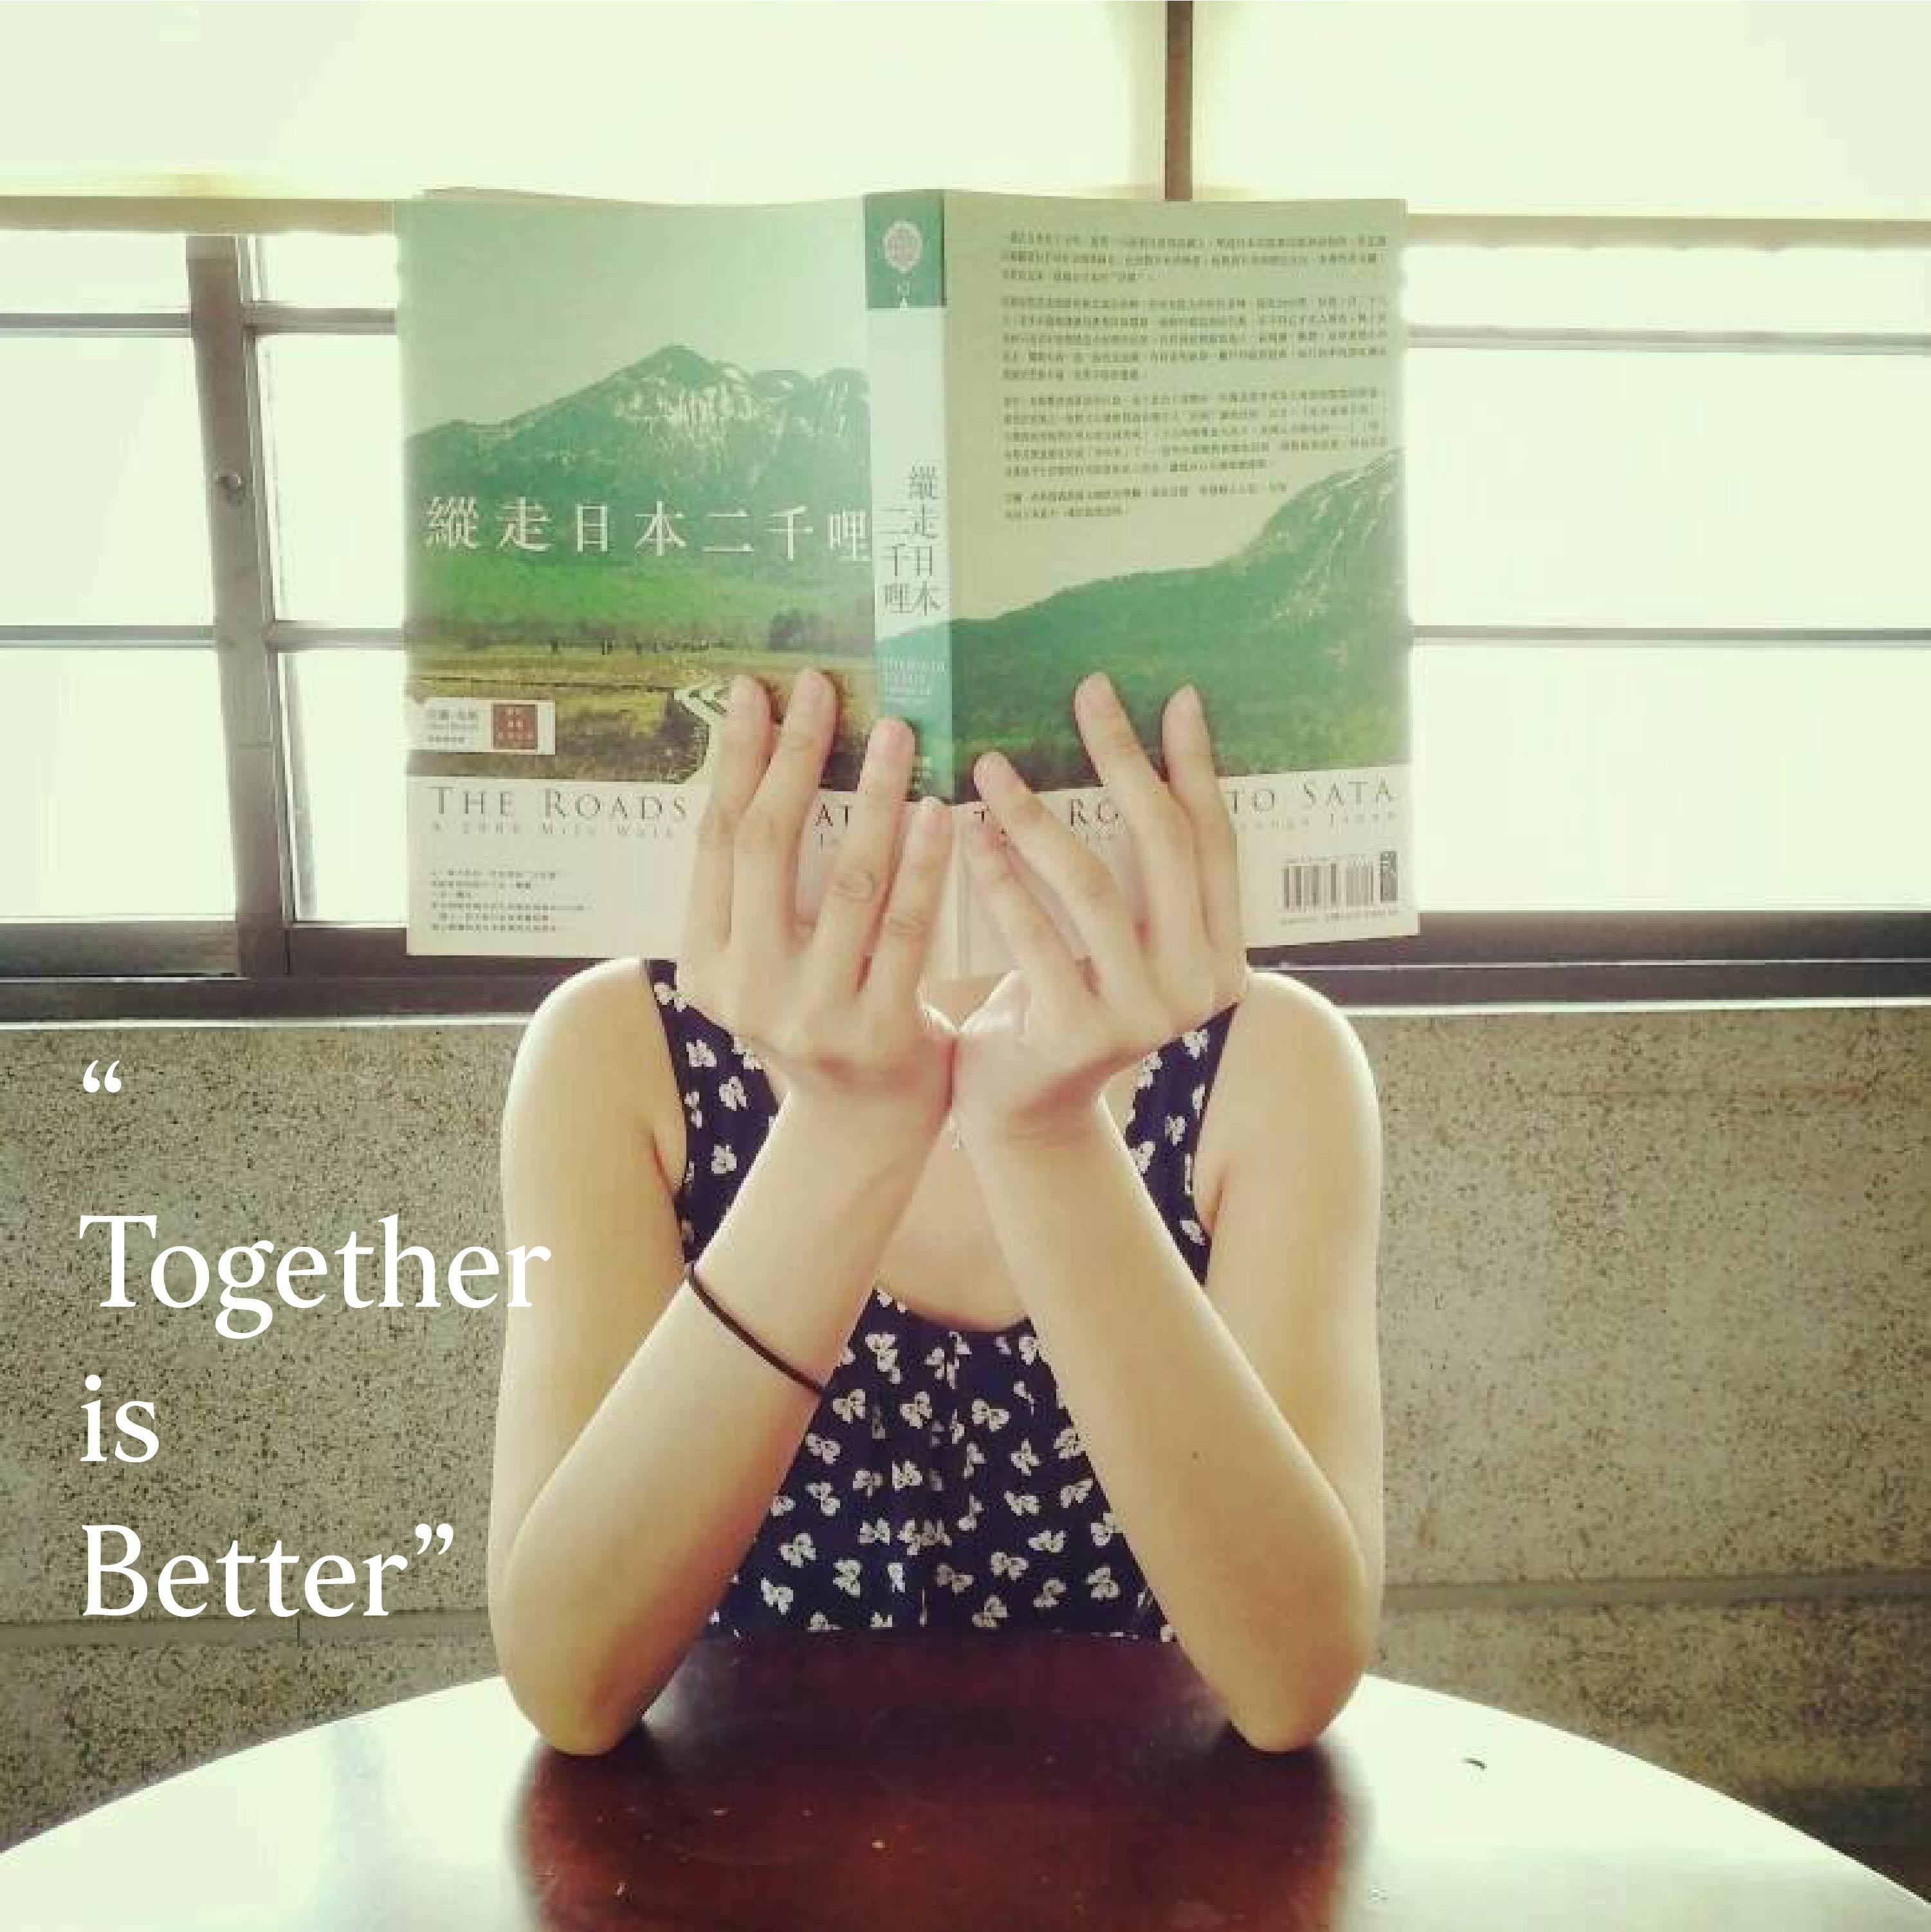 Together is Better|哪些繪本會讓你想到回憶中的旅行。一座小島 S3 Ep.1